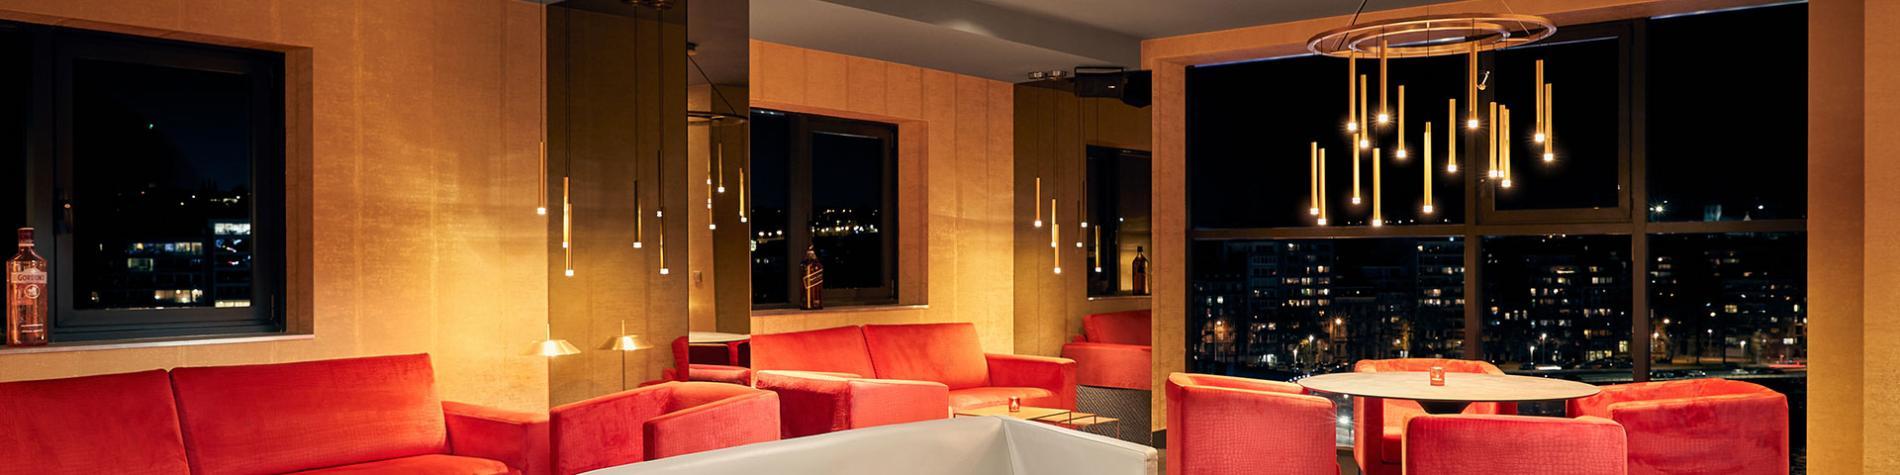 Hôtel - restaurant - Van der Valk - Liège Congrès - sky bar